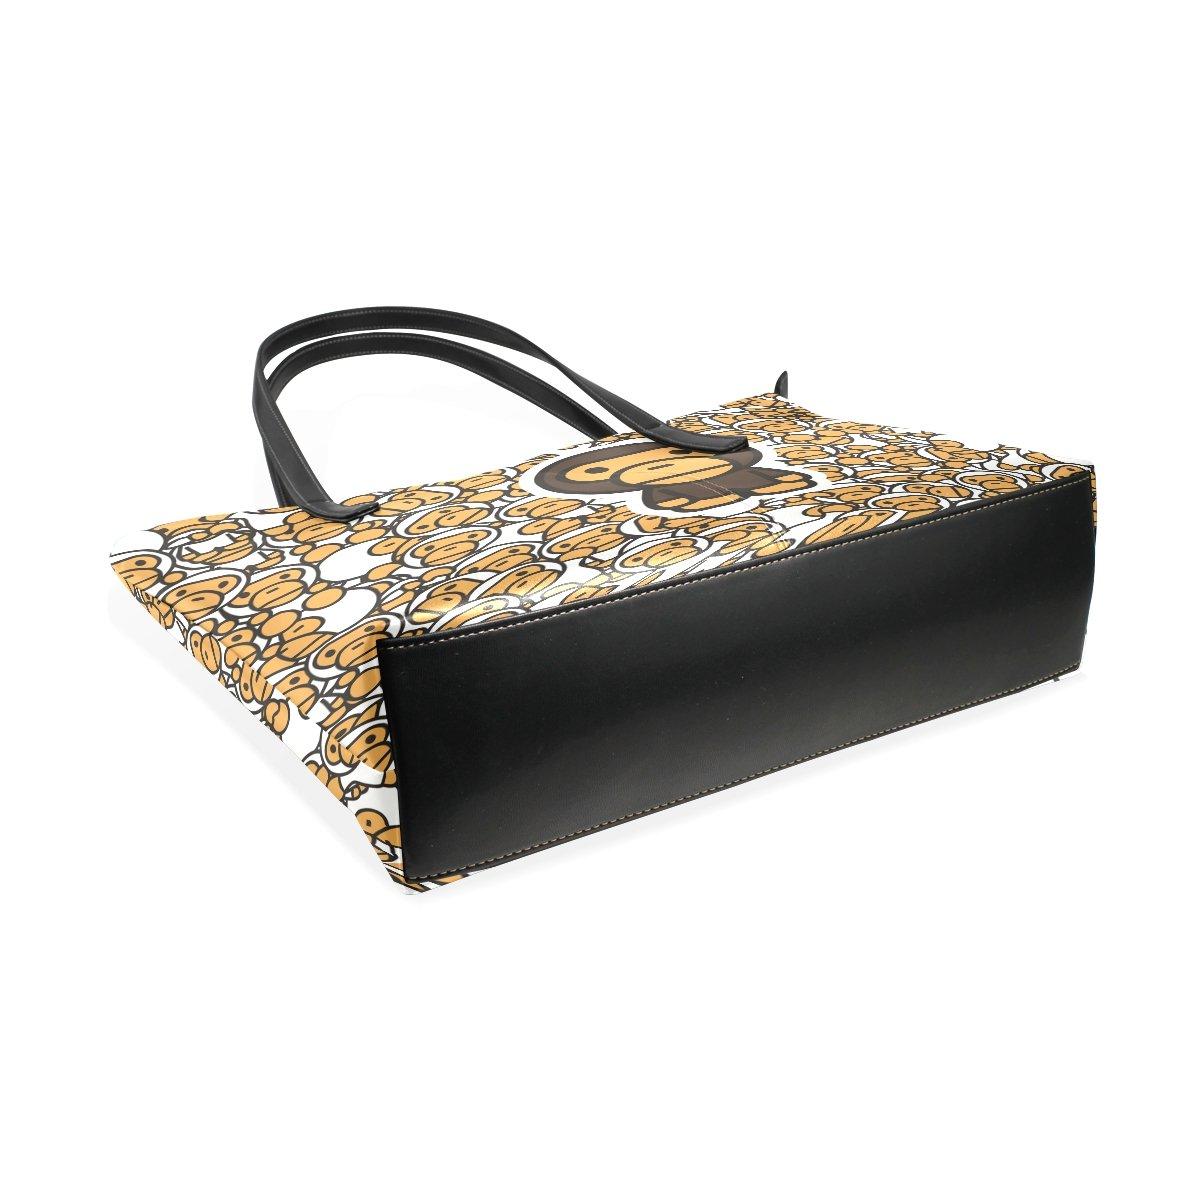 Women Leather Handbags Yellow Paul Frank Top Handle Shoulder Bags